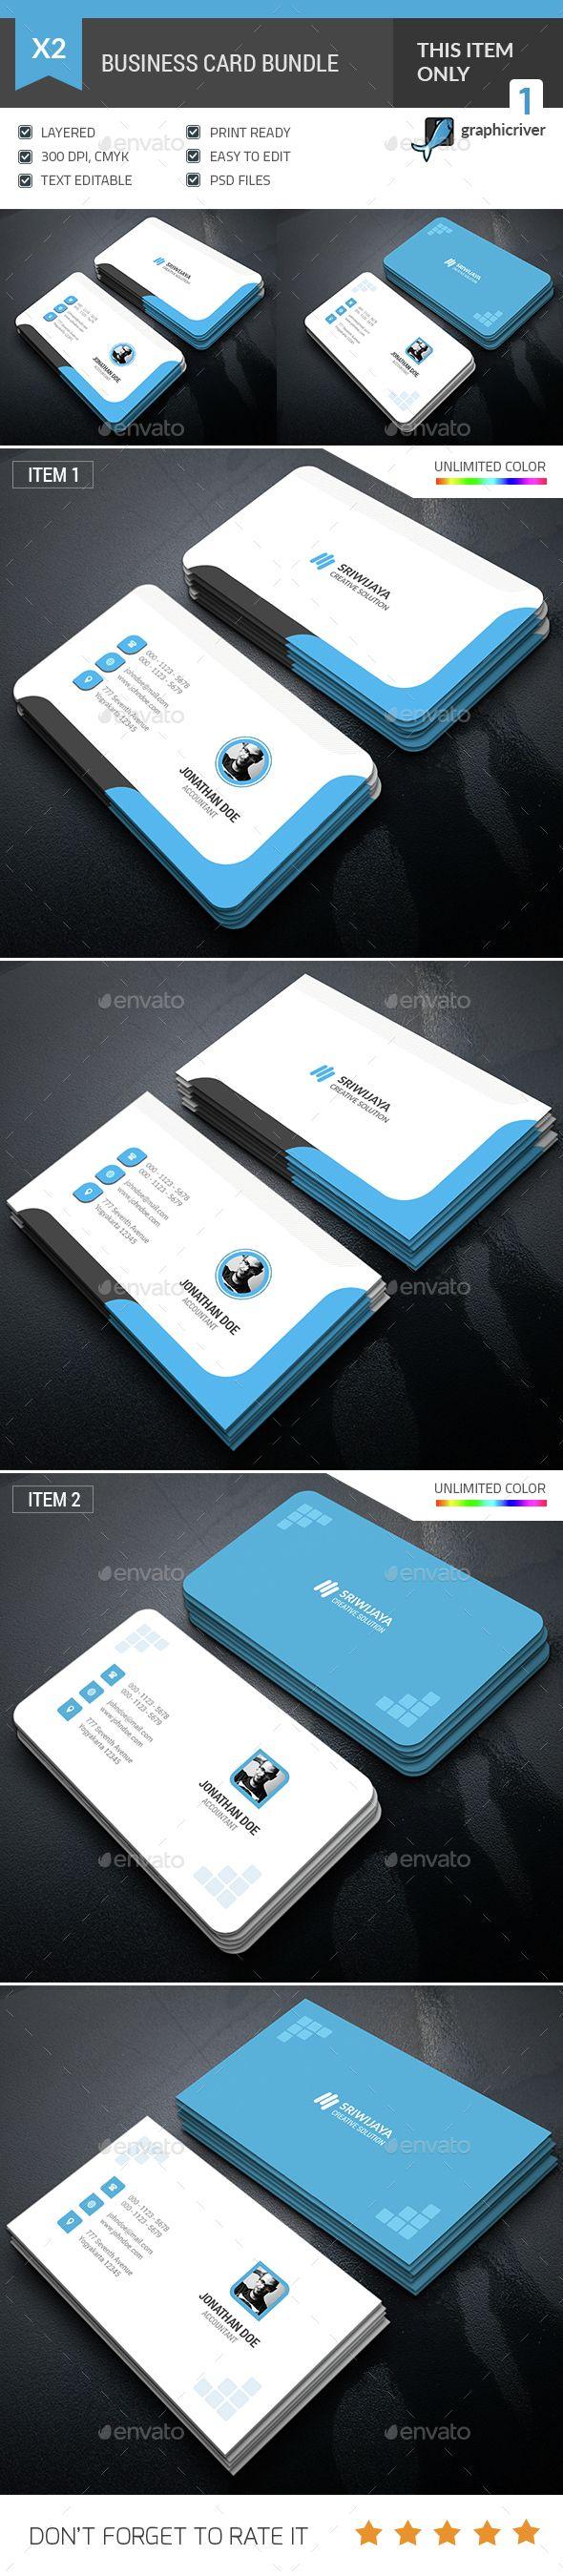 160 Best Business Cards Images On Pinterest Business Card Design